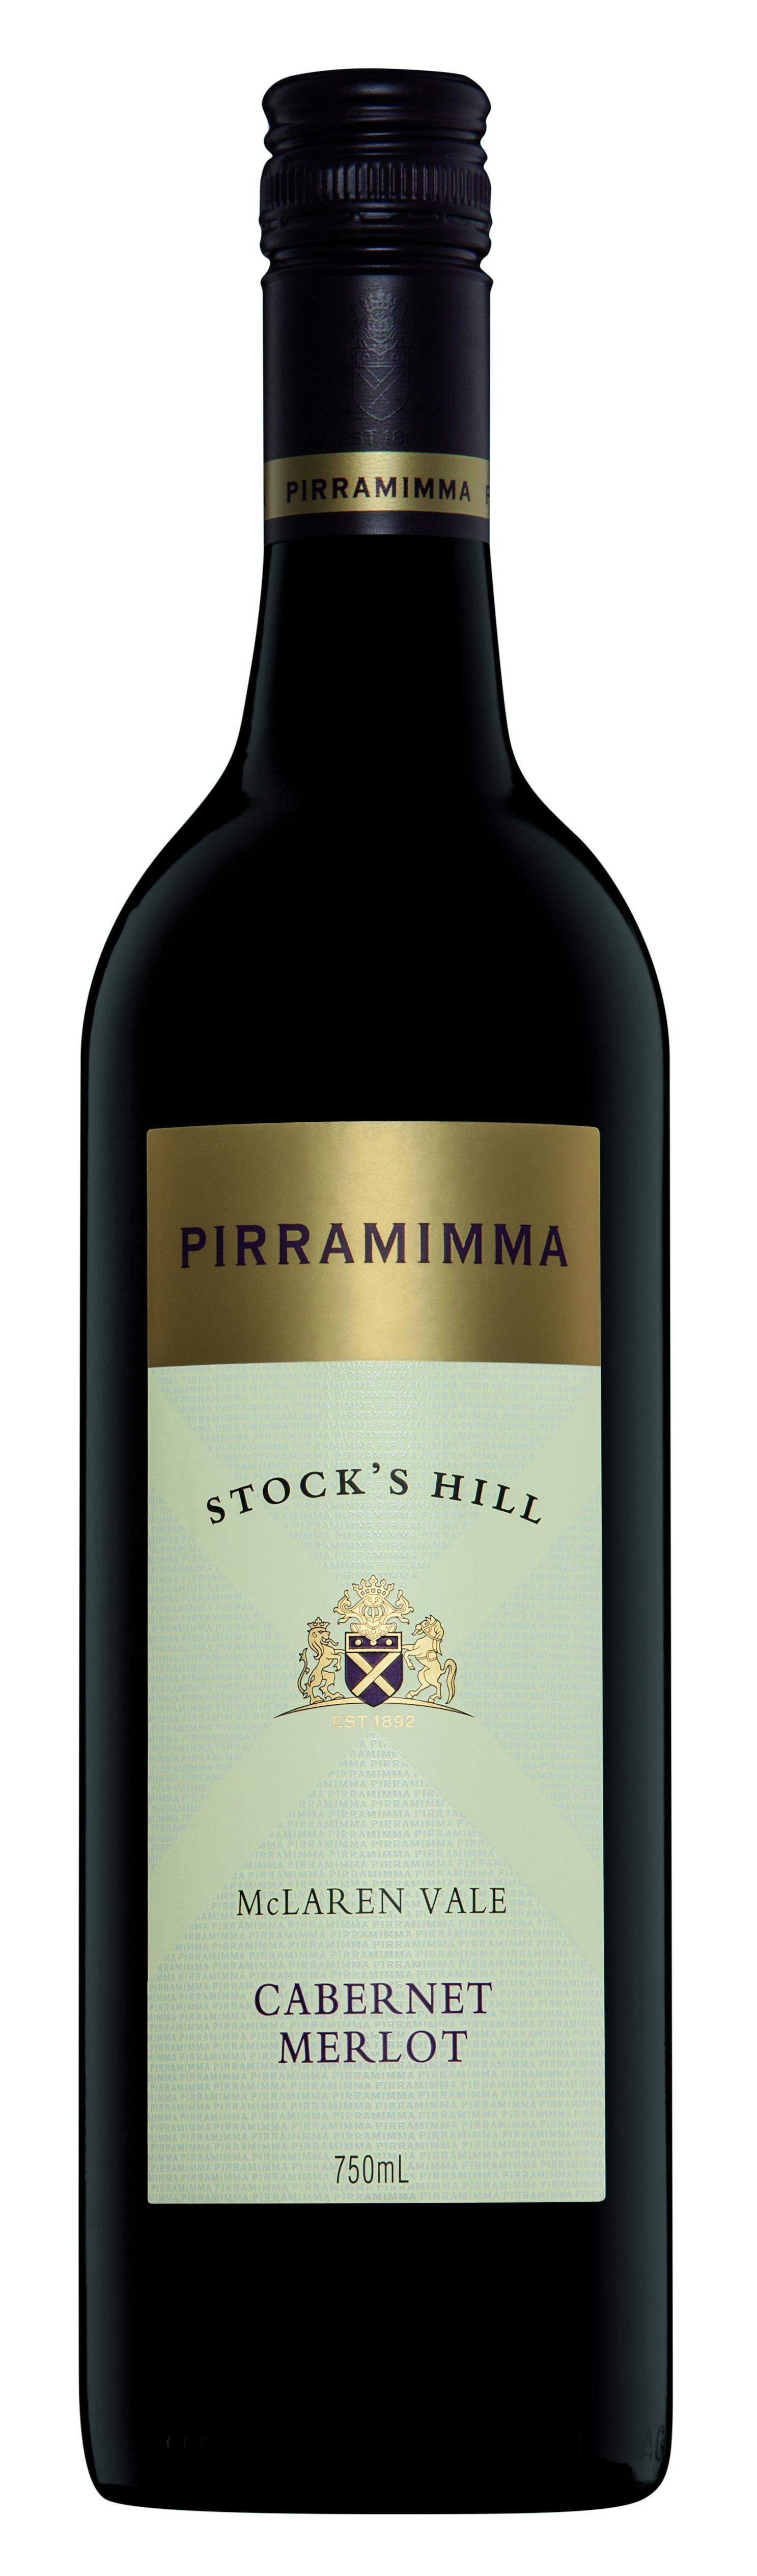 Pirramimma Stock's Hill Cabernet Merlot